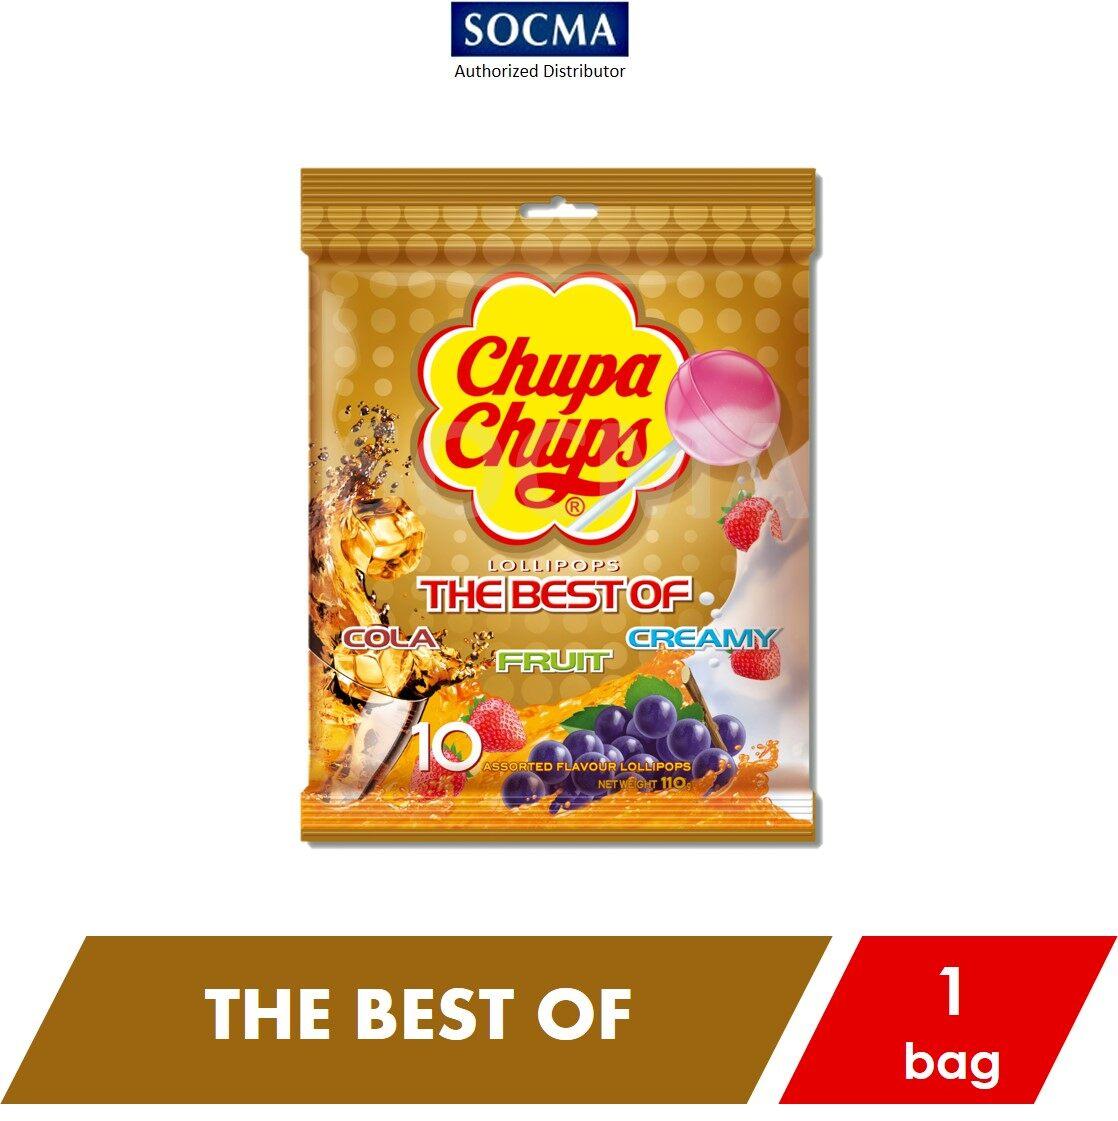 Chupa Chups Classic Best Of Cola Fruit Creamy 11g X 10s [1]